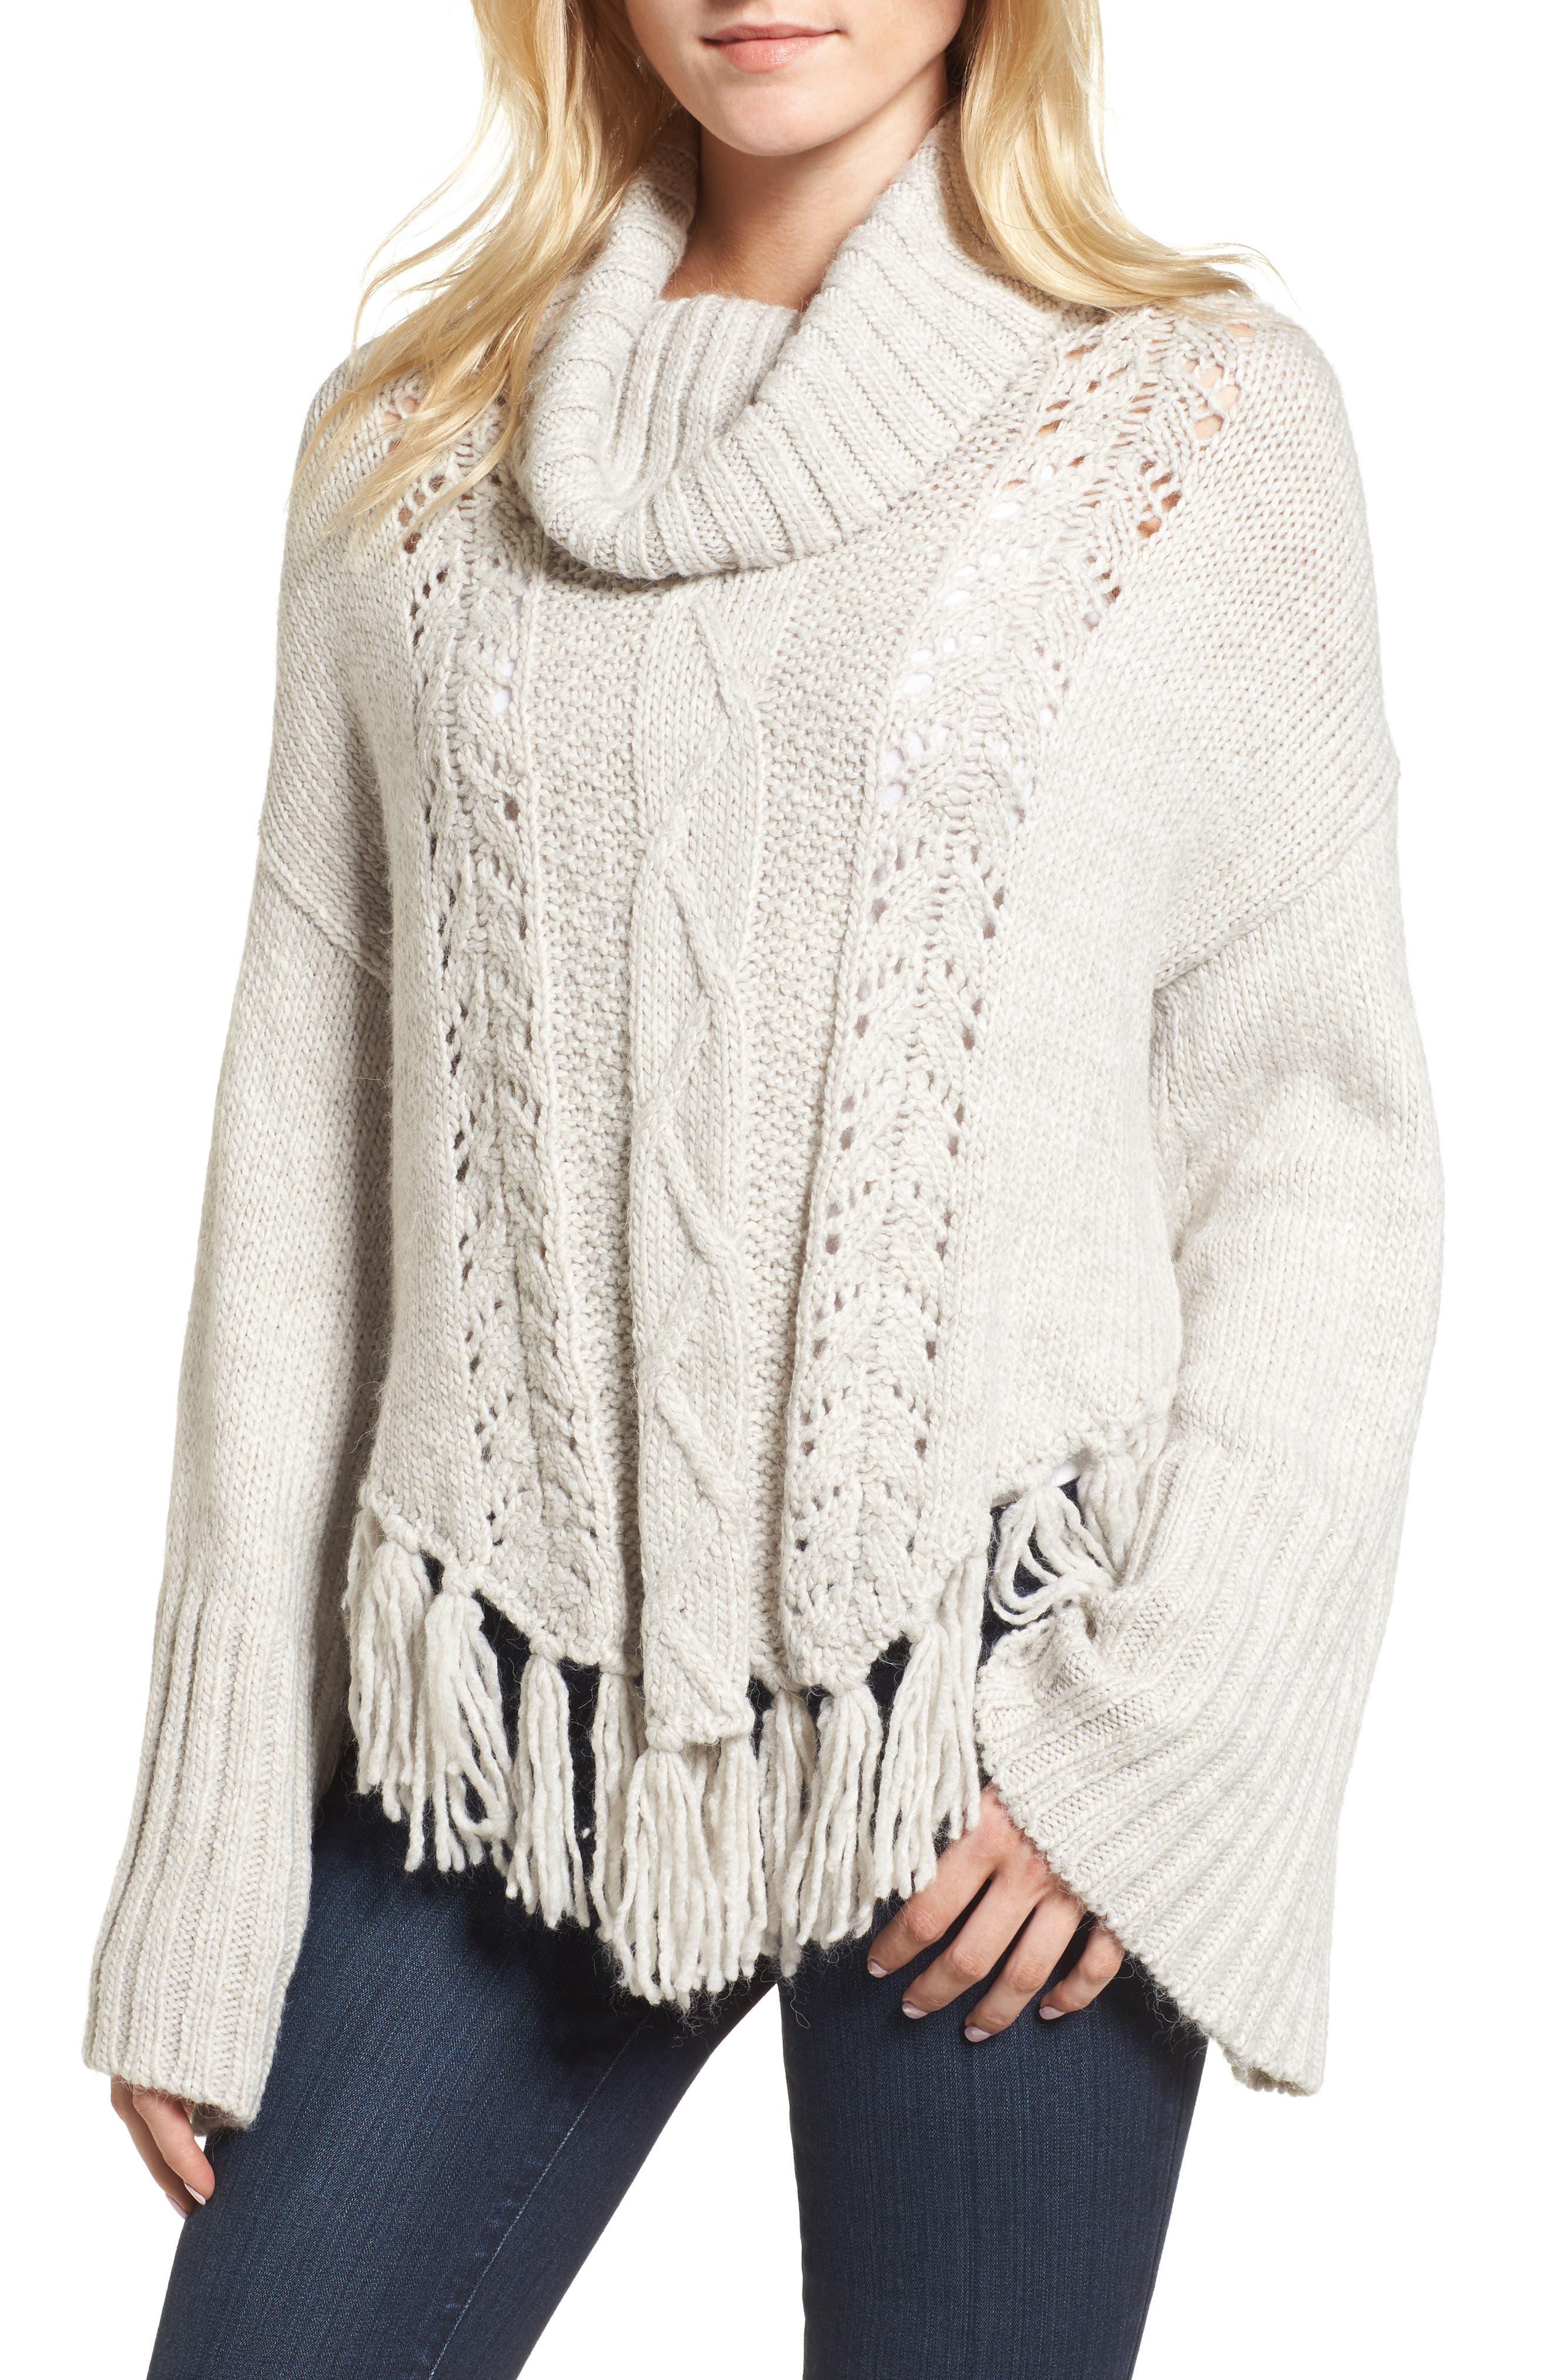 Prilla Fringe Cowl Neck Sweater,                             Main thumbnail 1, color,                             Latte